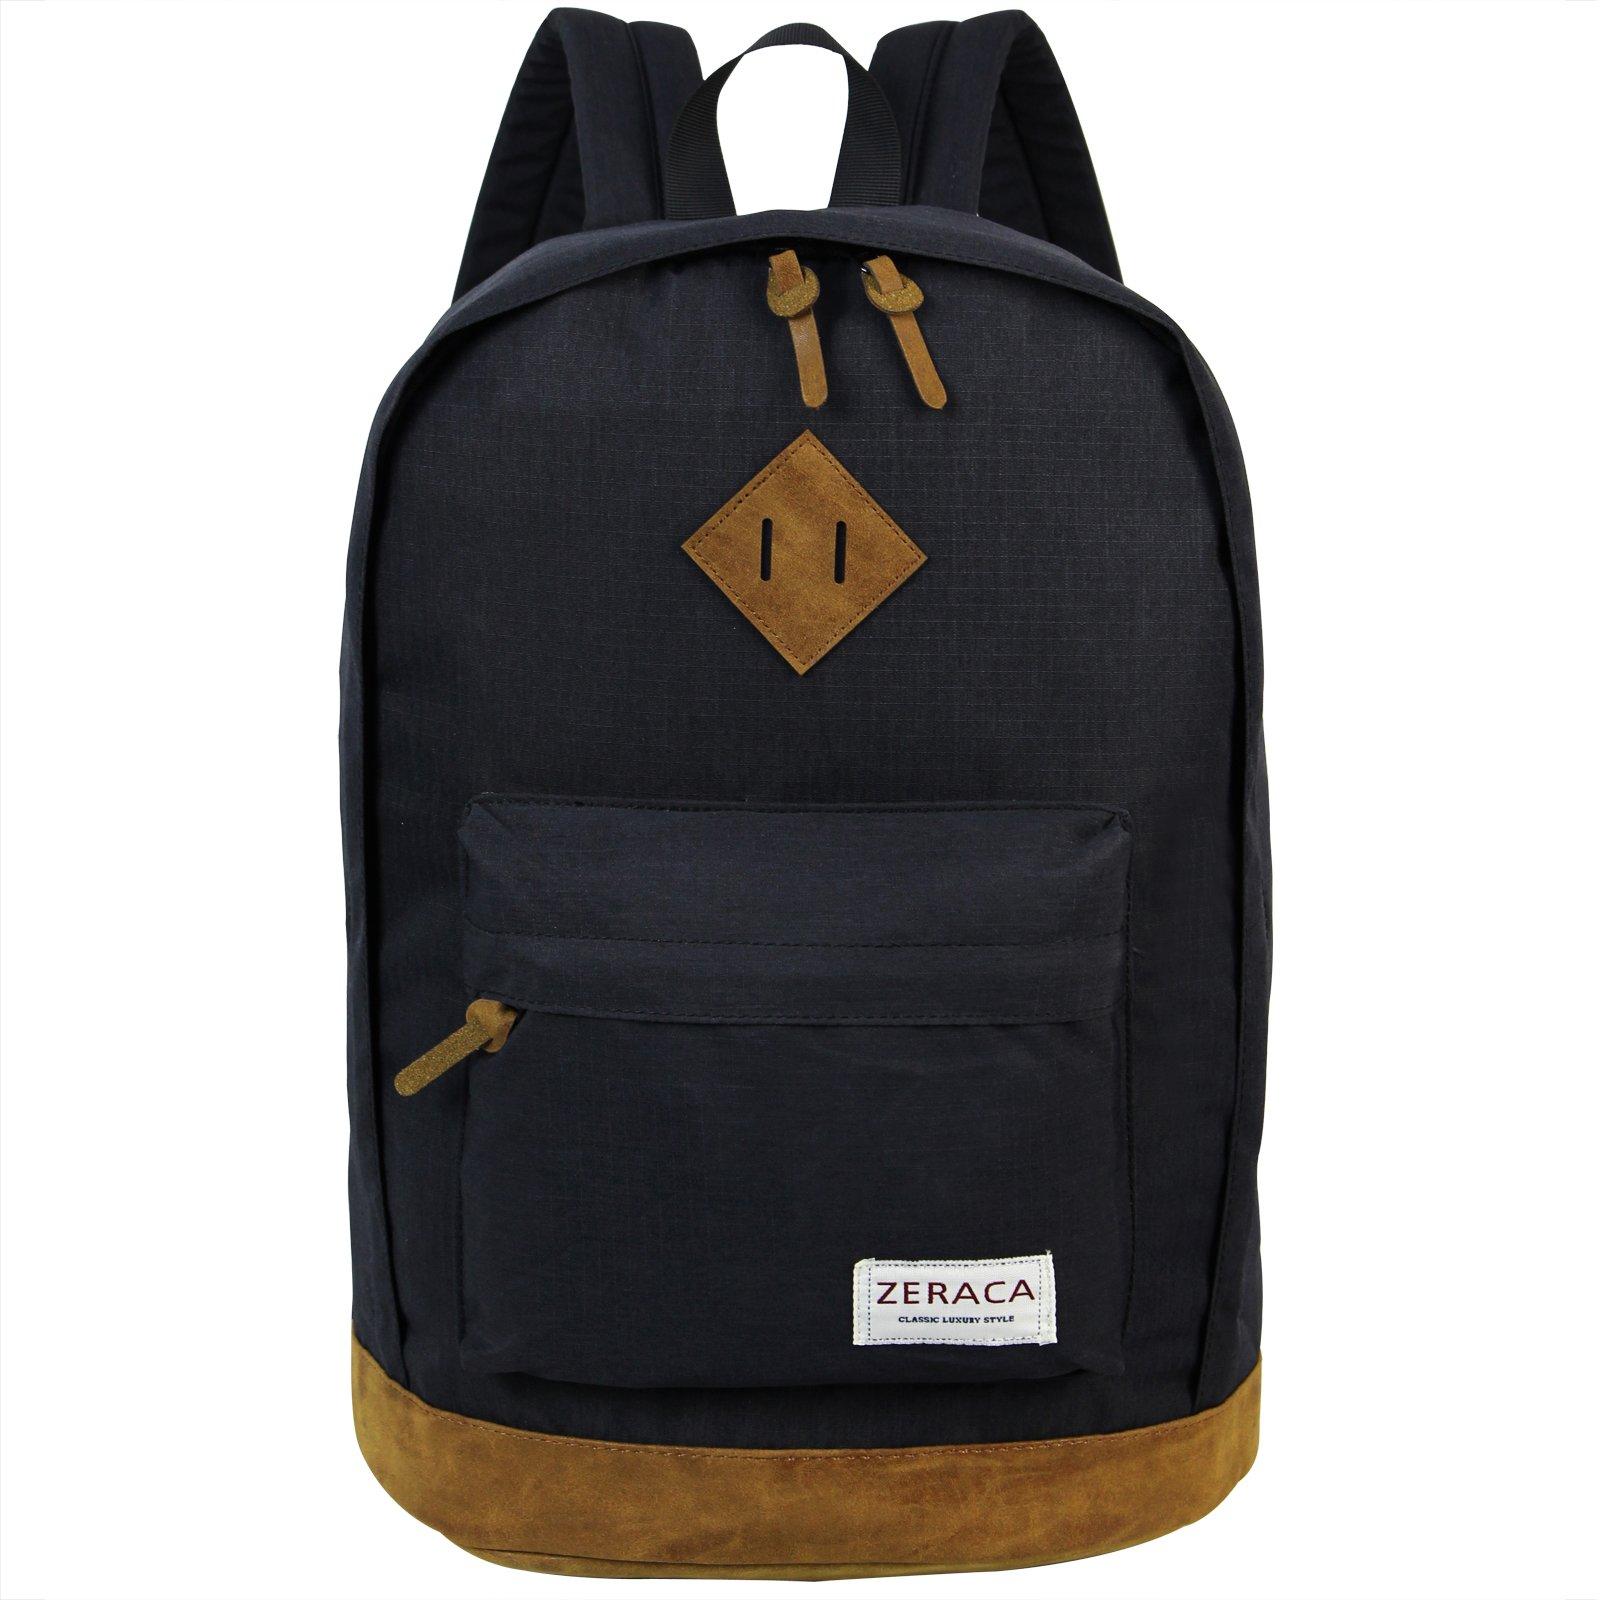 Zeraca Fashion Canvas Waterproof Laptop Backpack for High School College Black